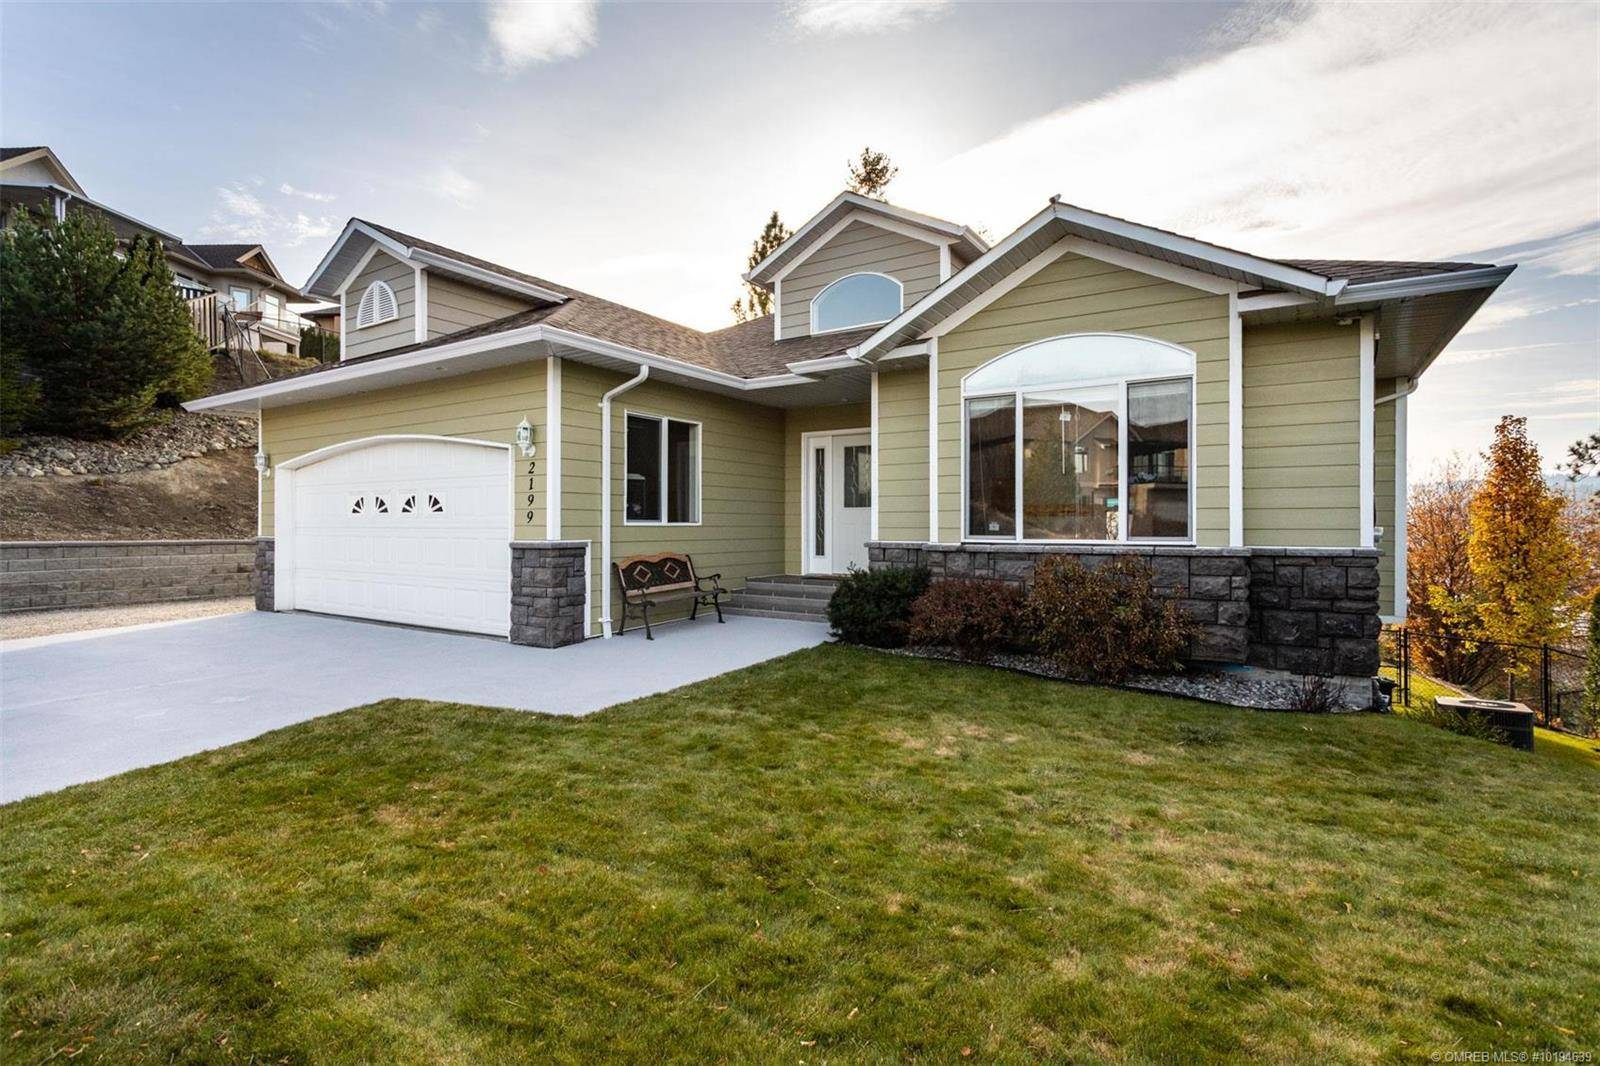 House for sale at 2199 Quail Run Dr Kelowna British Columbia - MLS: 10194639